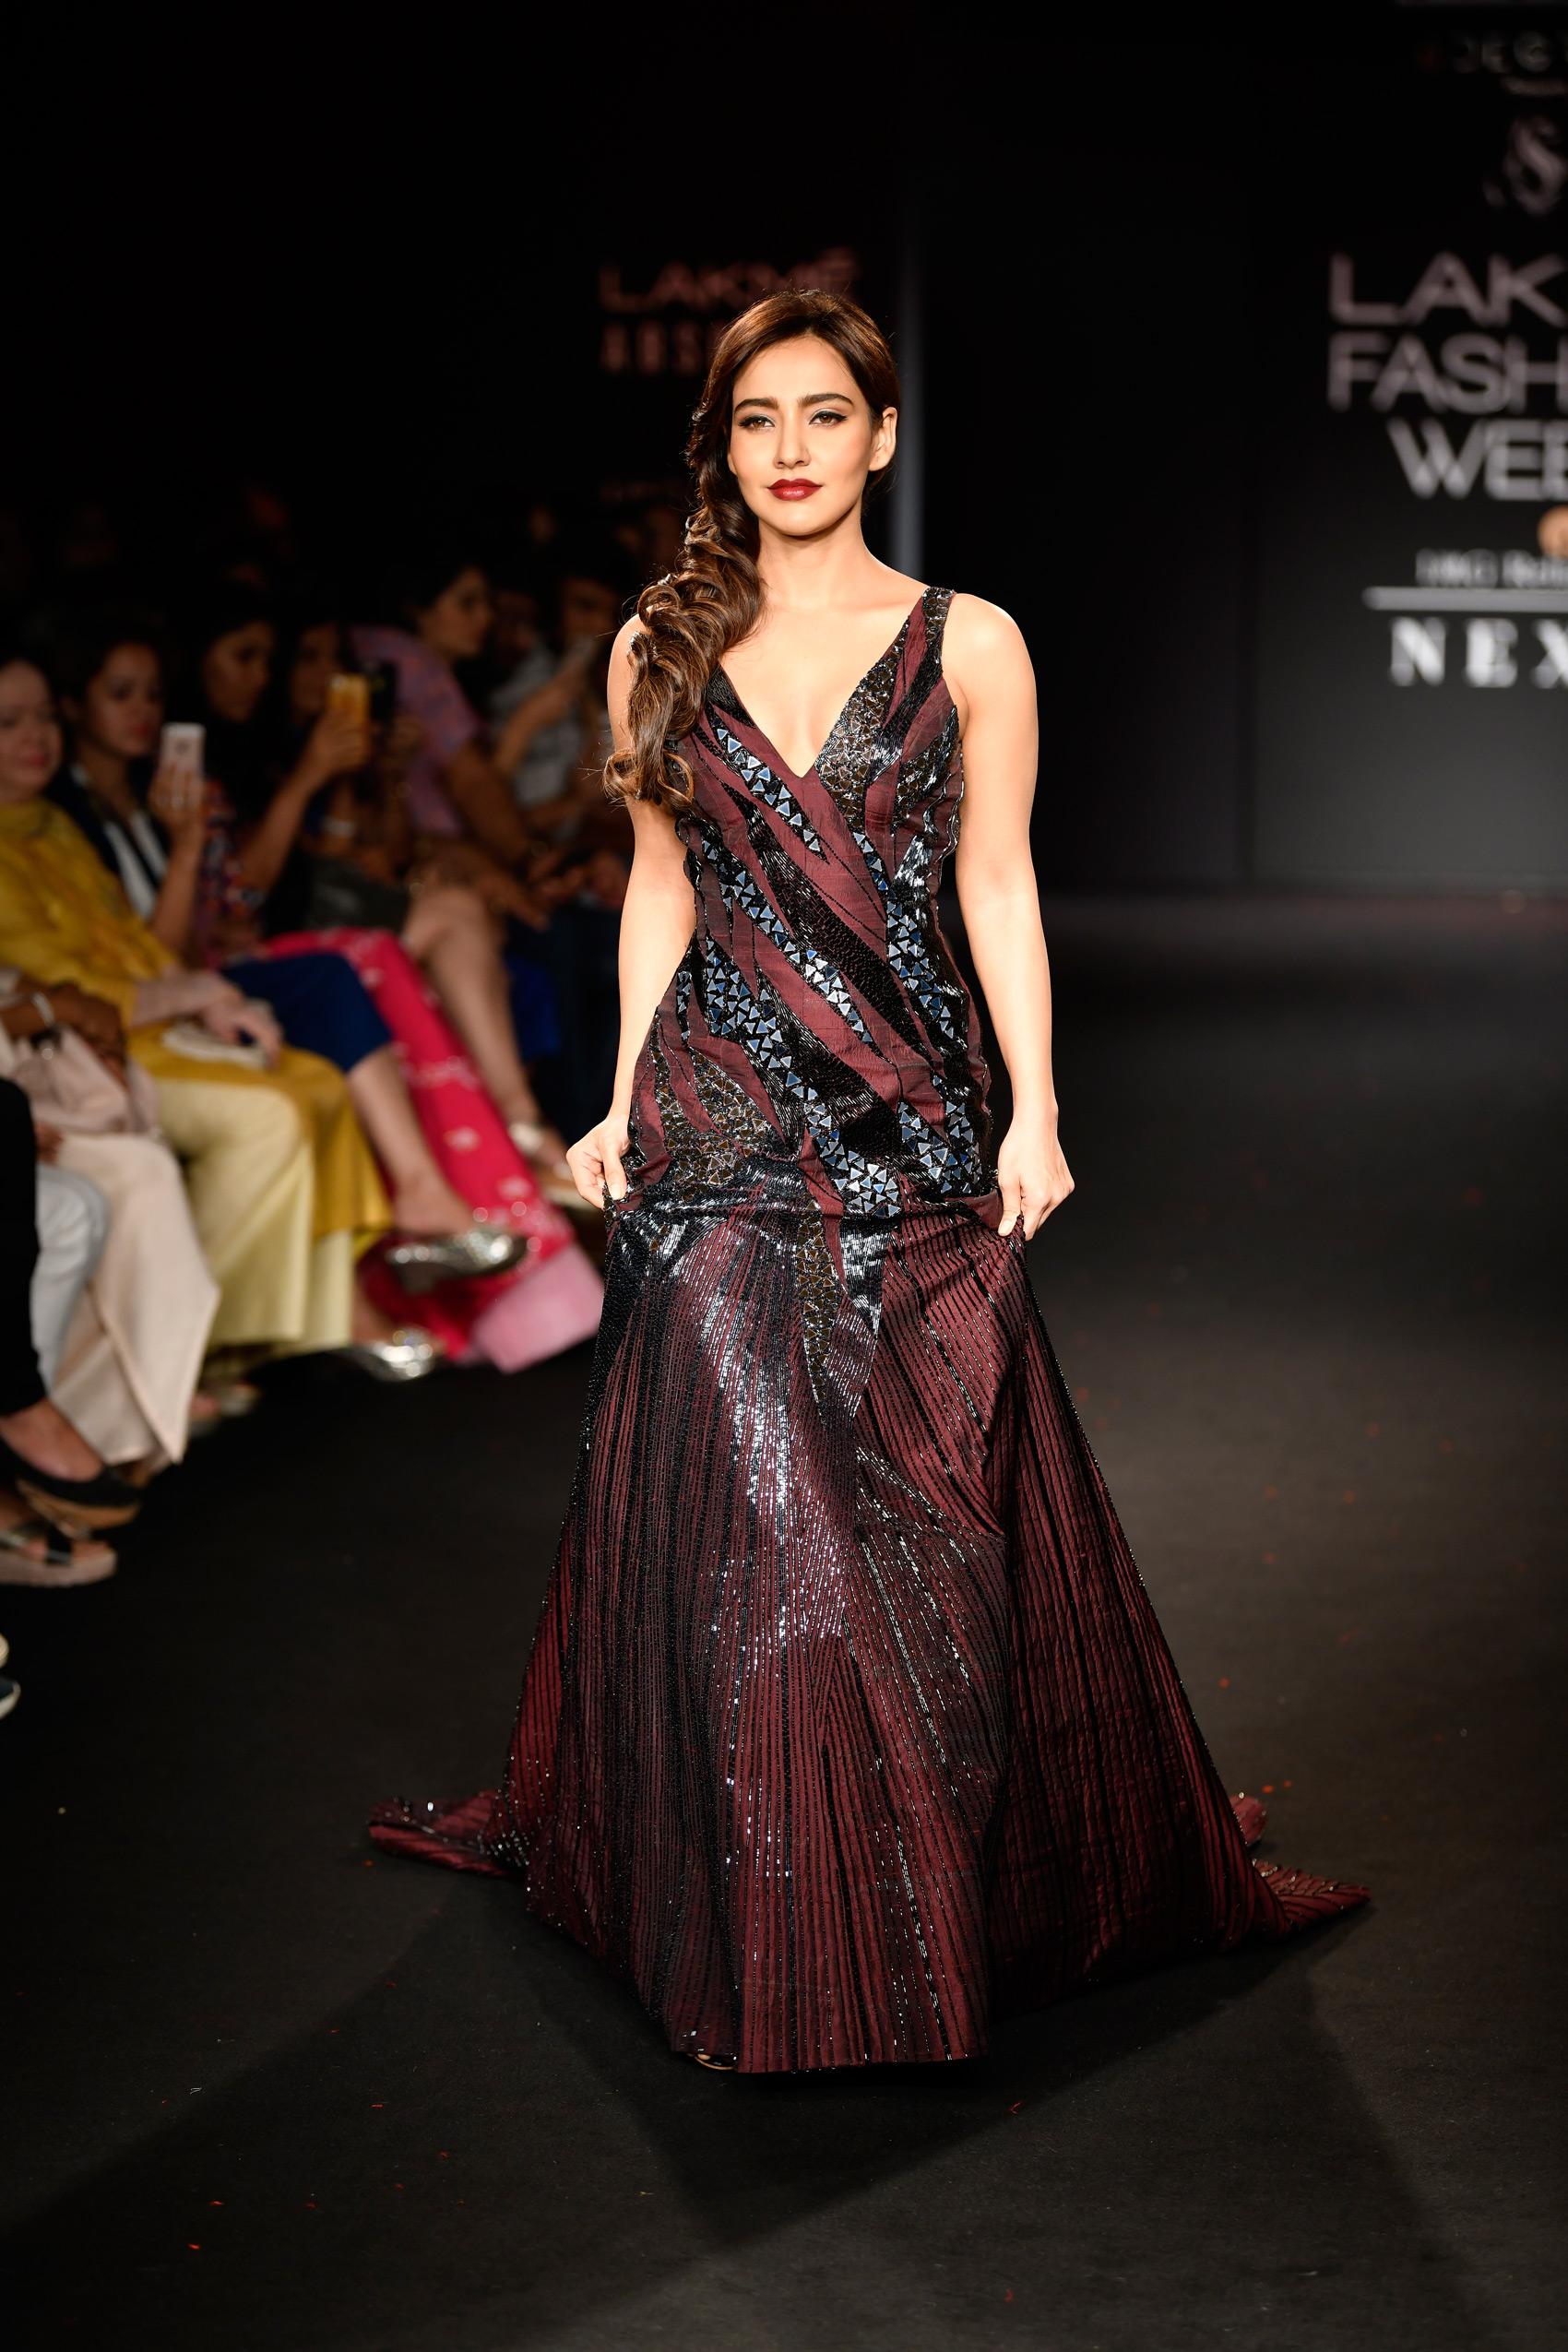 PunjabKesari, Mermaid Gowns Design Image, मरमेड गाउन डिज़ाइन इमेज